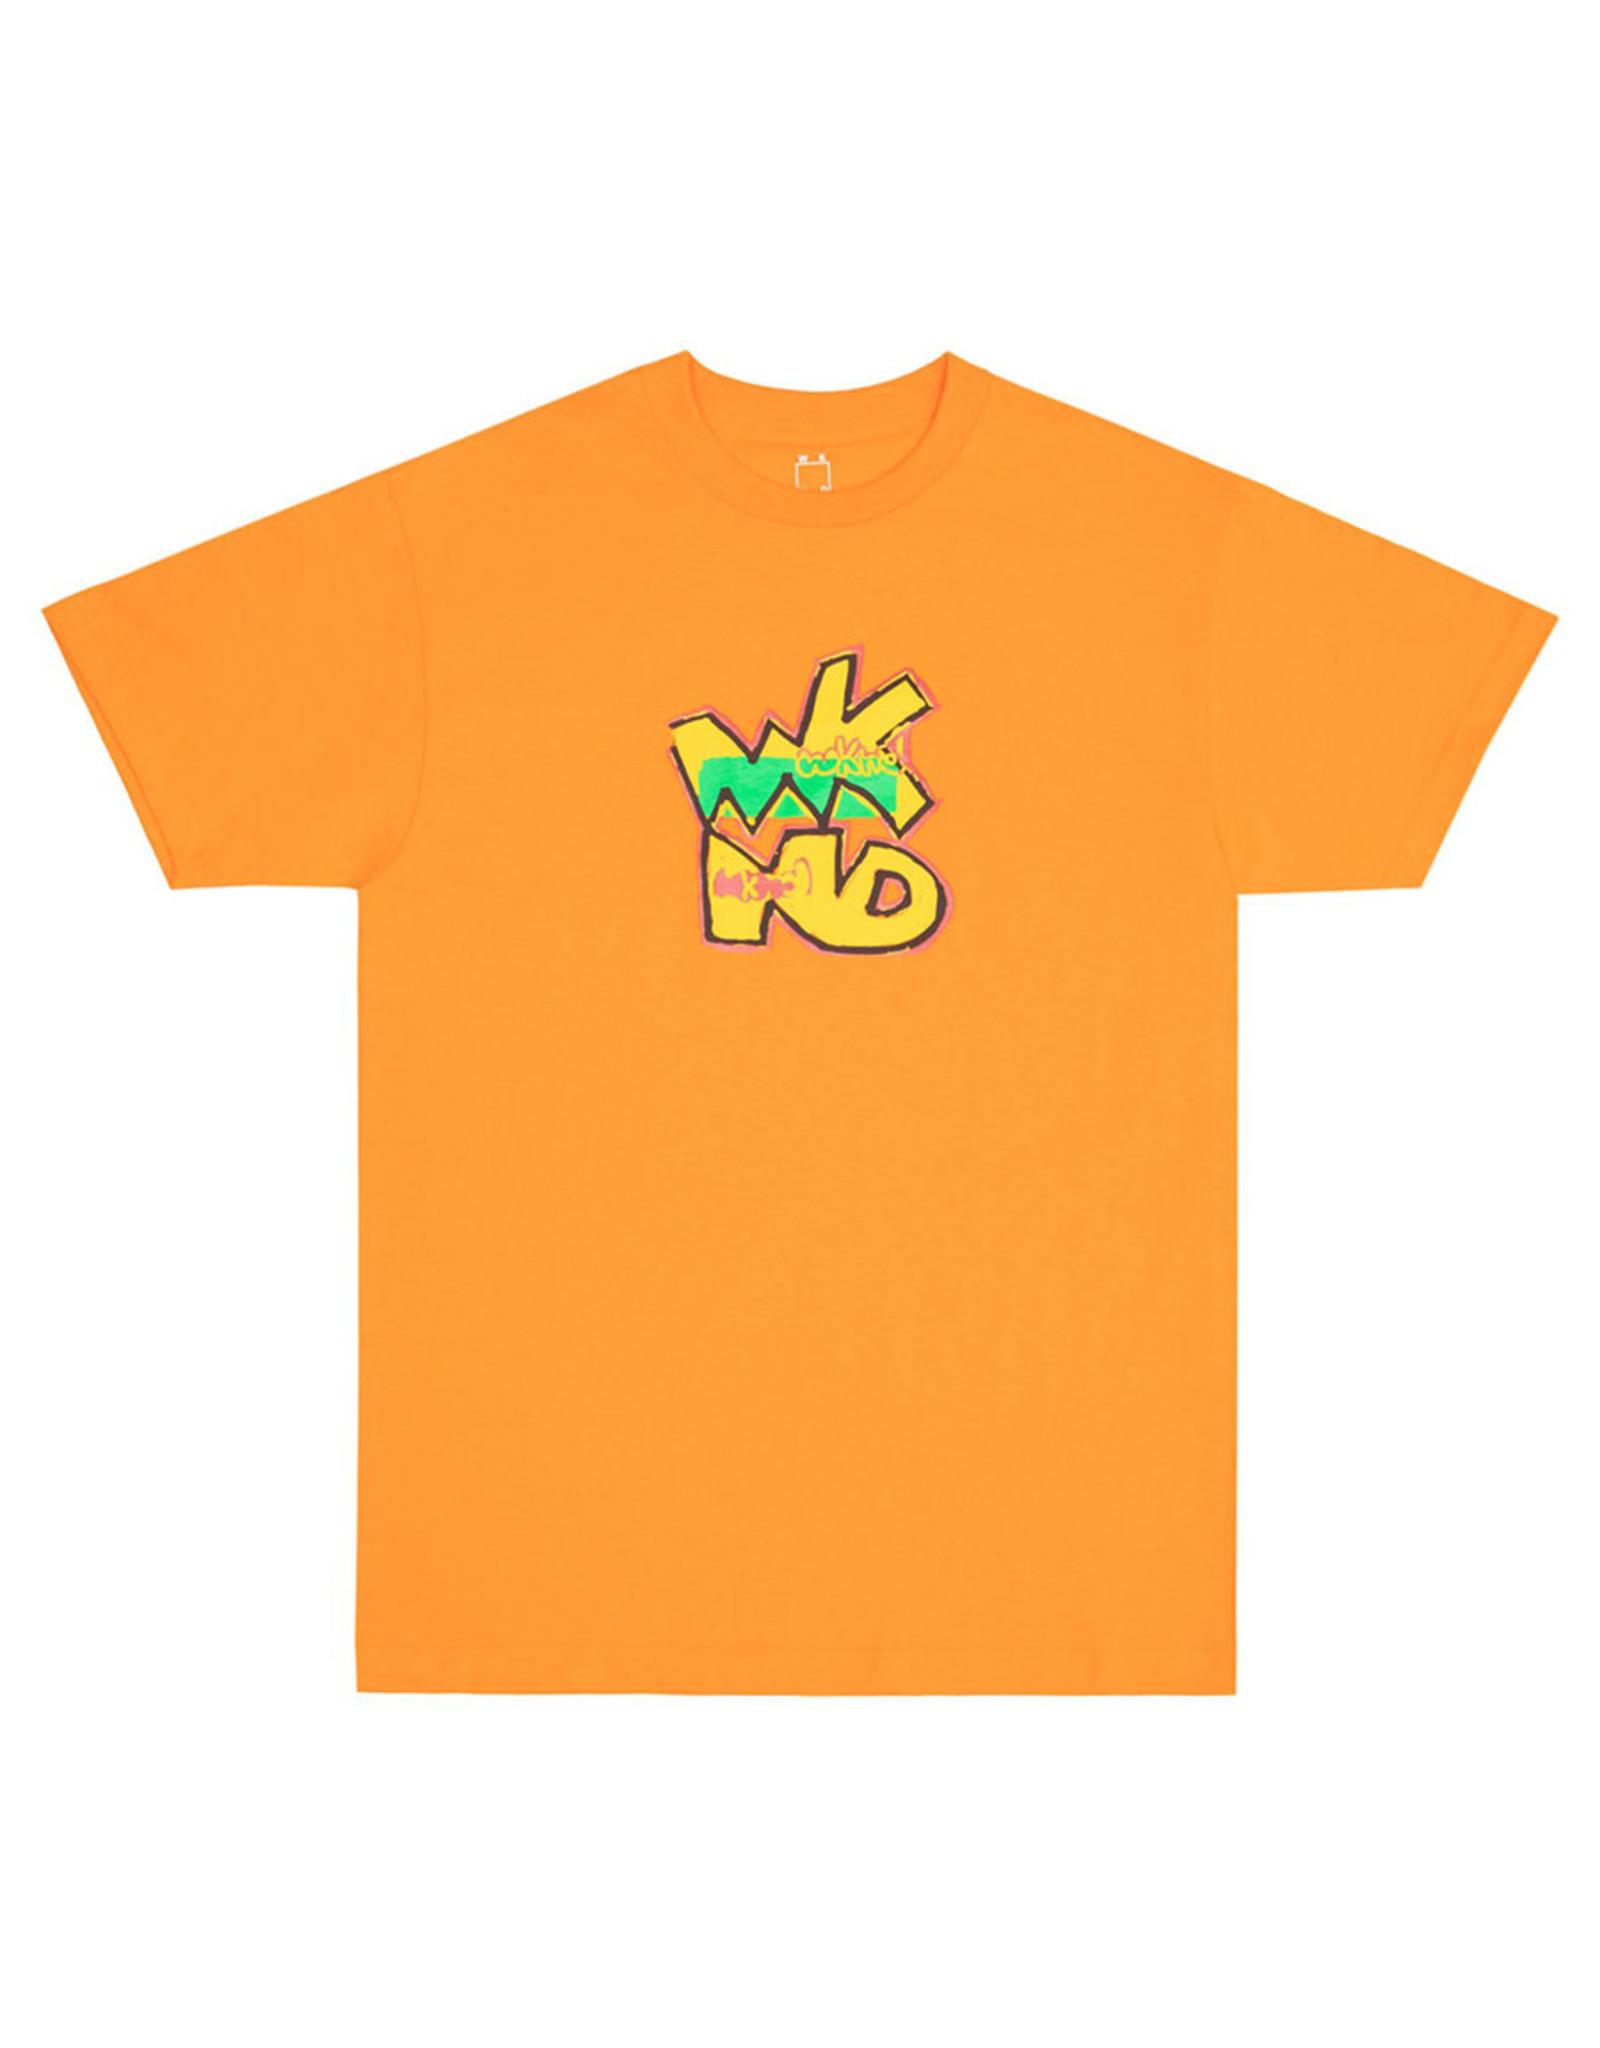 Wknd Skateboards Wknd Tee Happy Feet S/S (Orange)